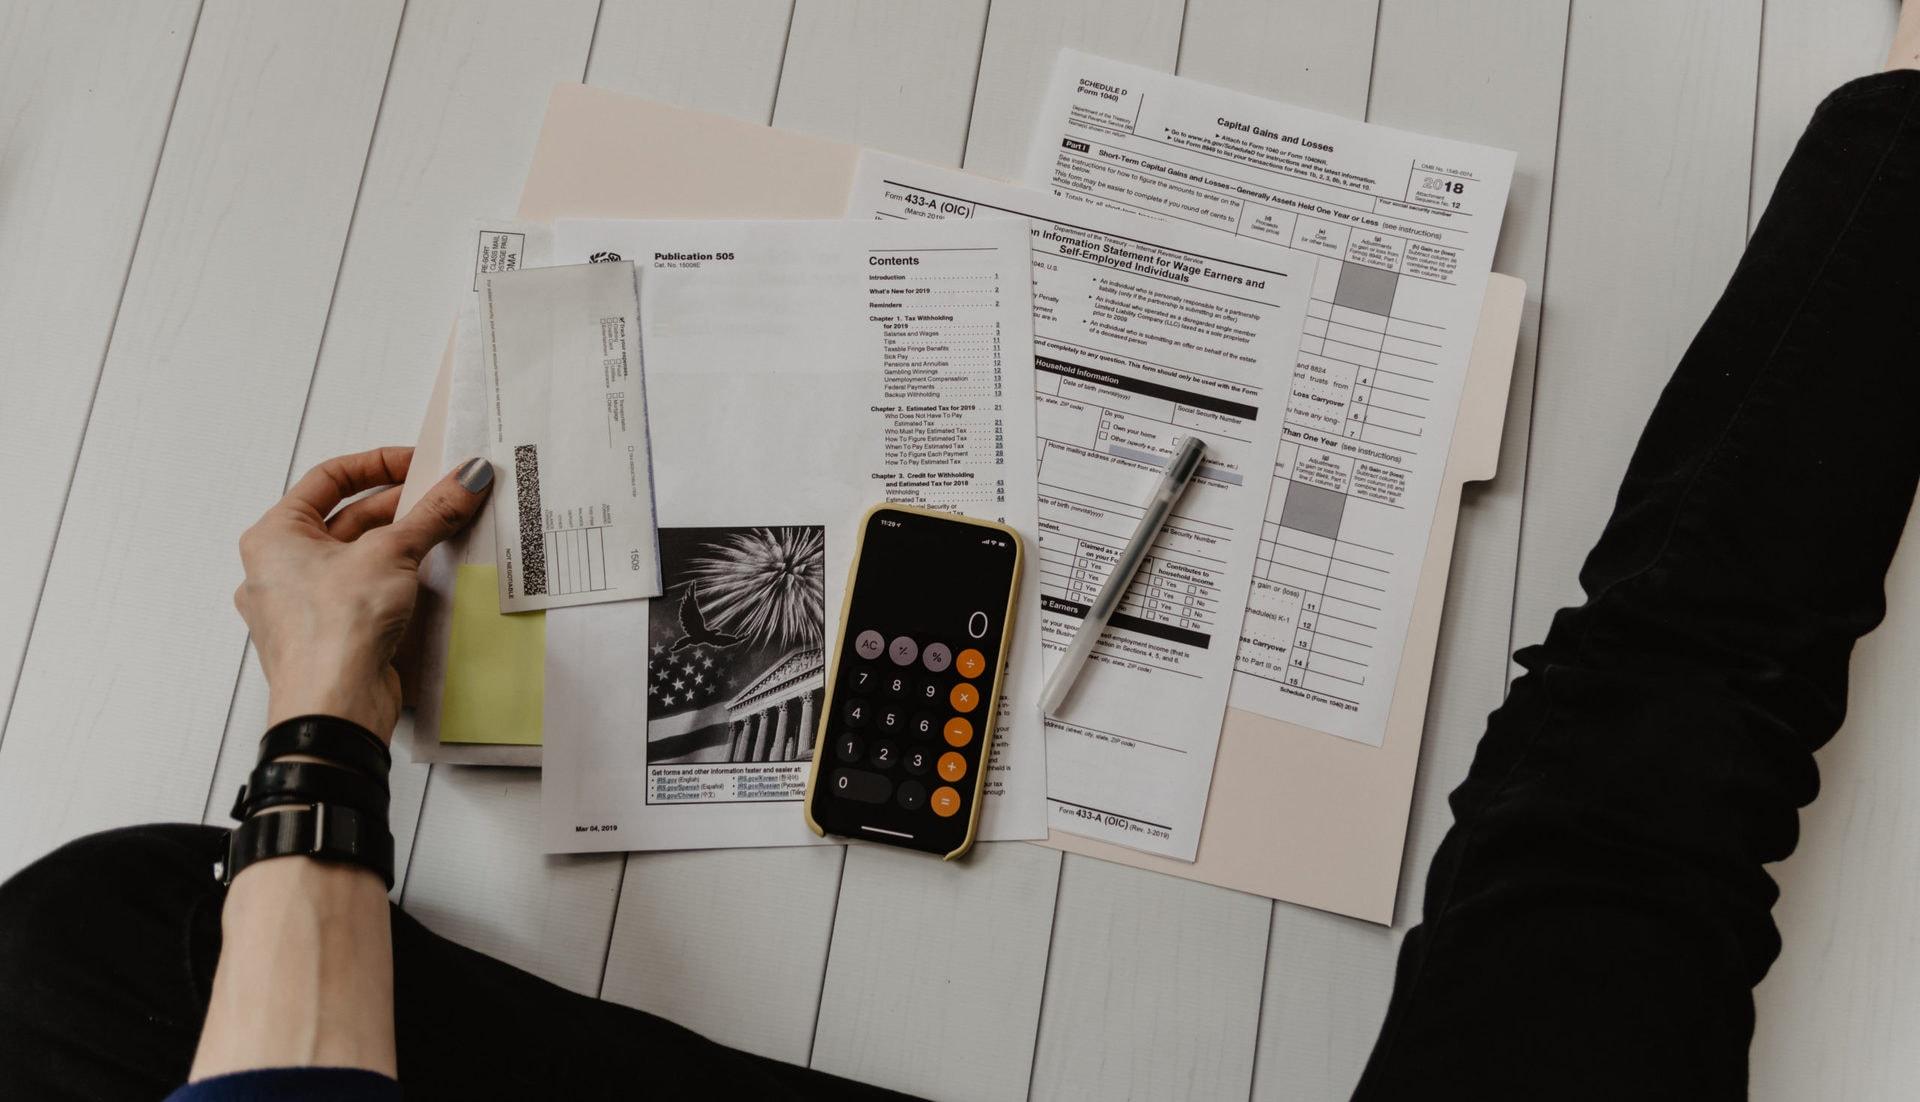 kelly sikkema xoU52jUVUXA unsplash scaled R&D Tax Credits and Patent Box